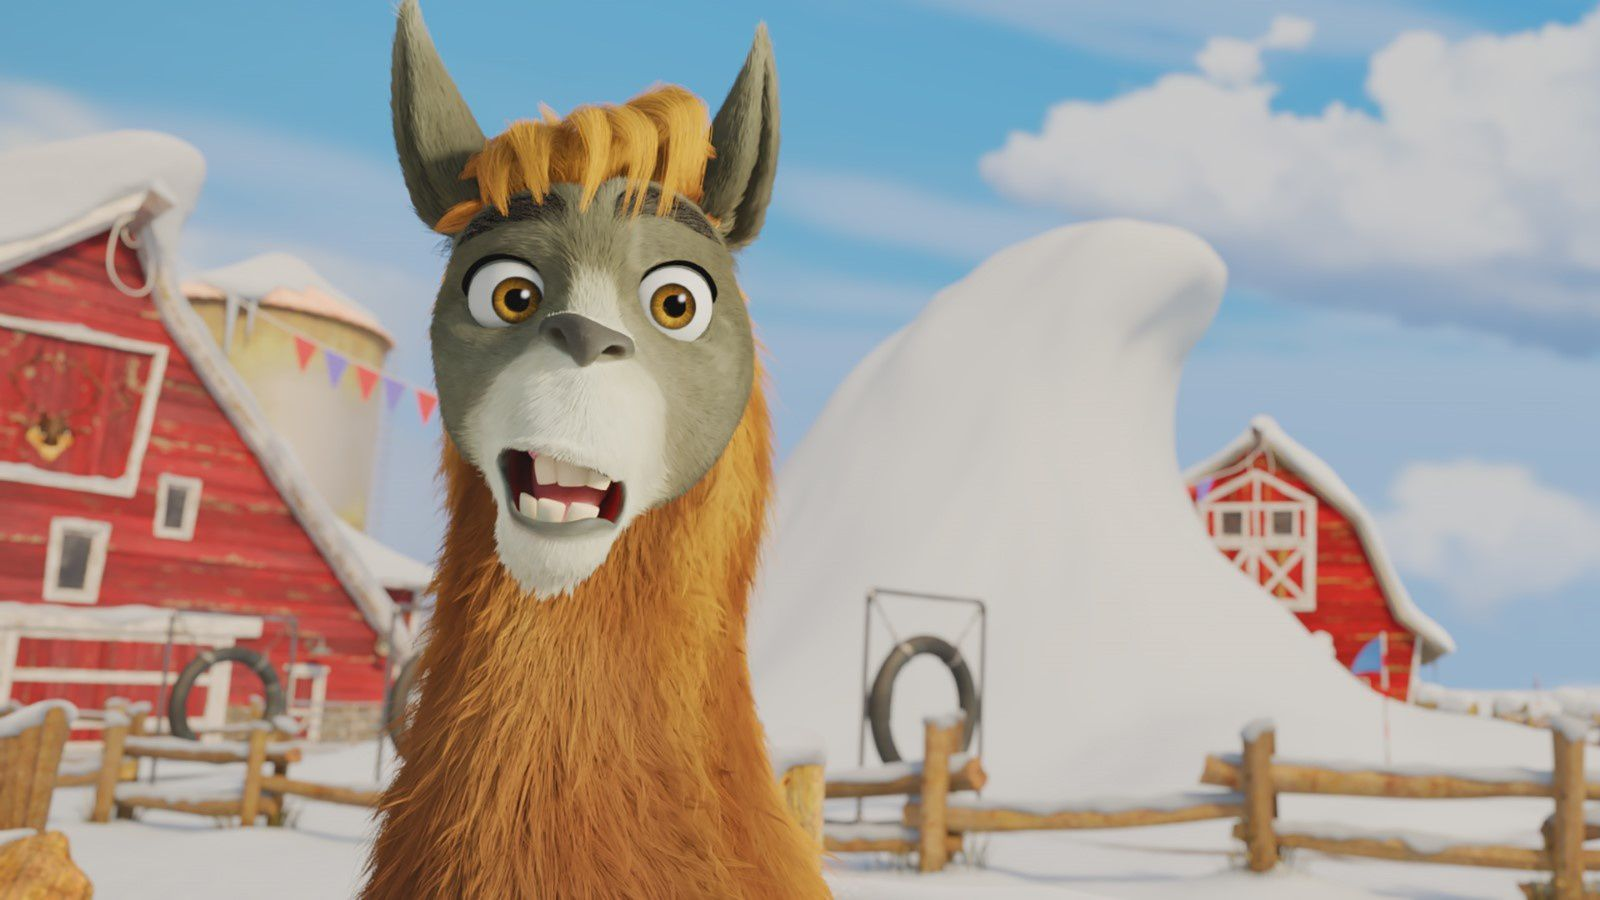 Elliot : the Littlest Reindeer (BANDE-ANNONCE) avec les voix de Morena Baccarin, John Cleese, Josh Hutcherson